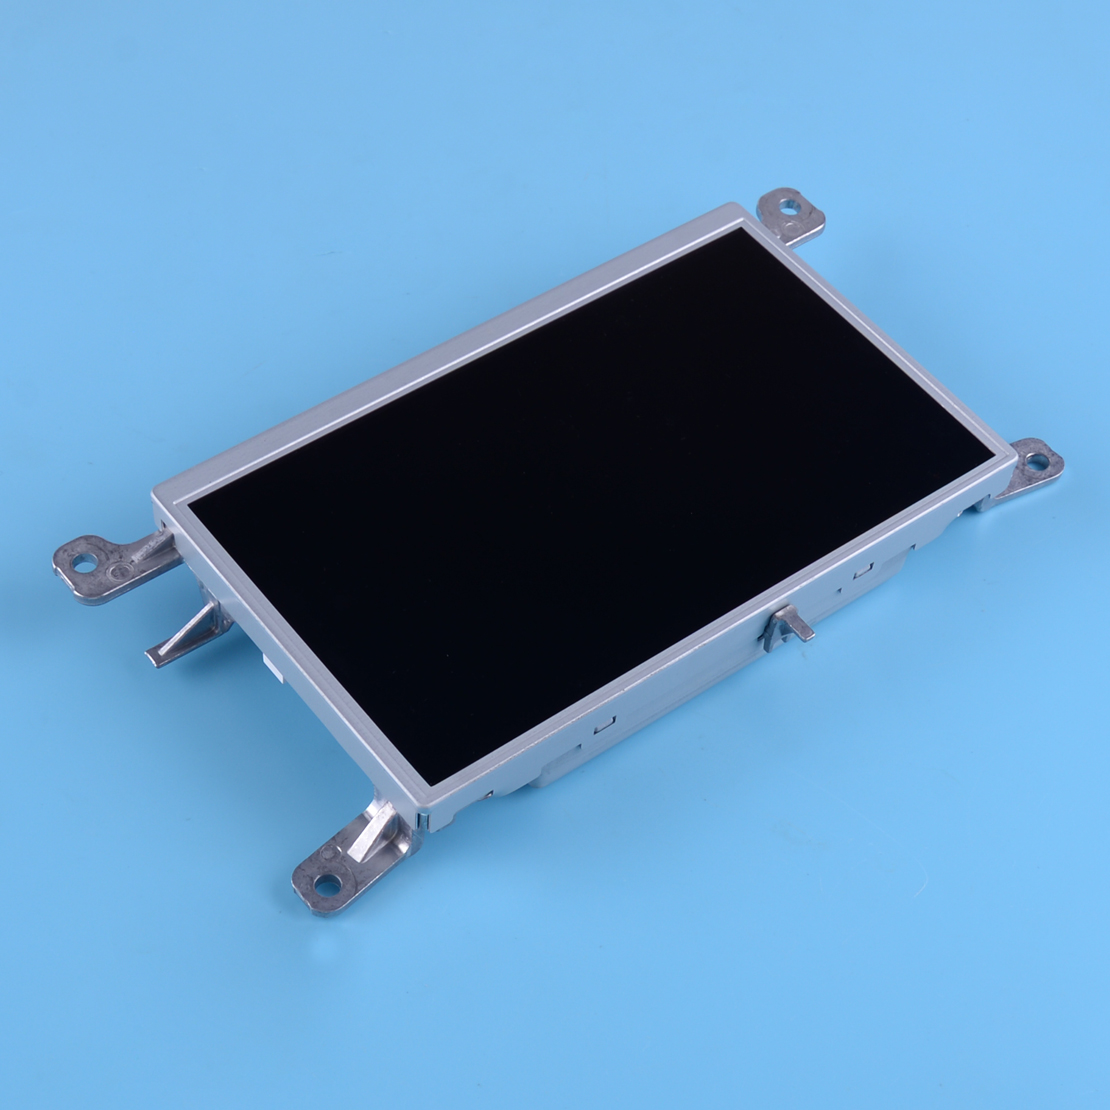 OEM MMI LCD Display Monitor Screen Info Dash Radio For AUDI A4 S4 B8 A5 Q5 08-15